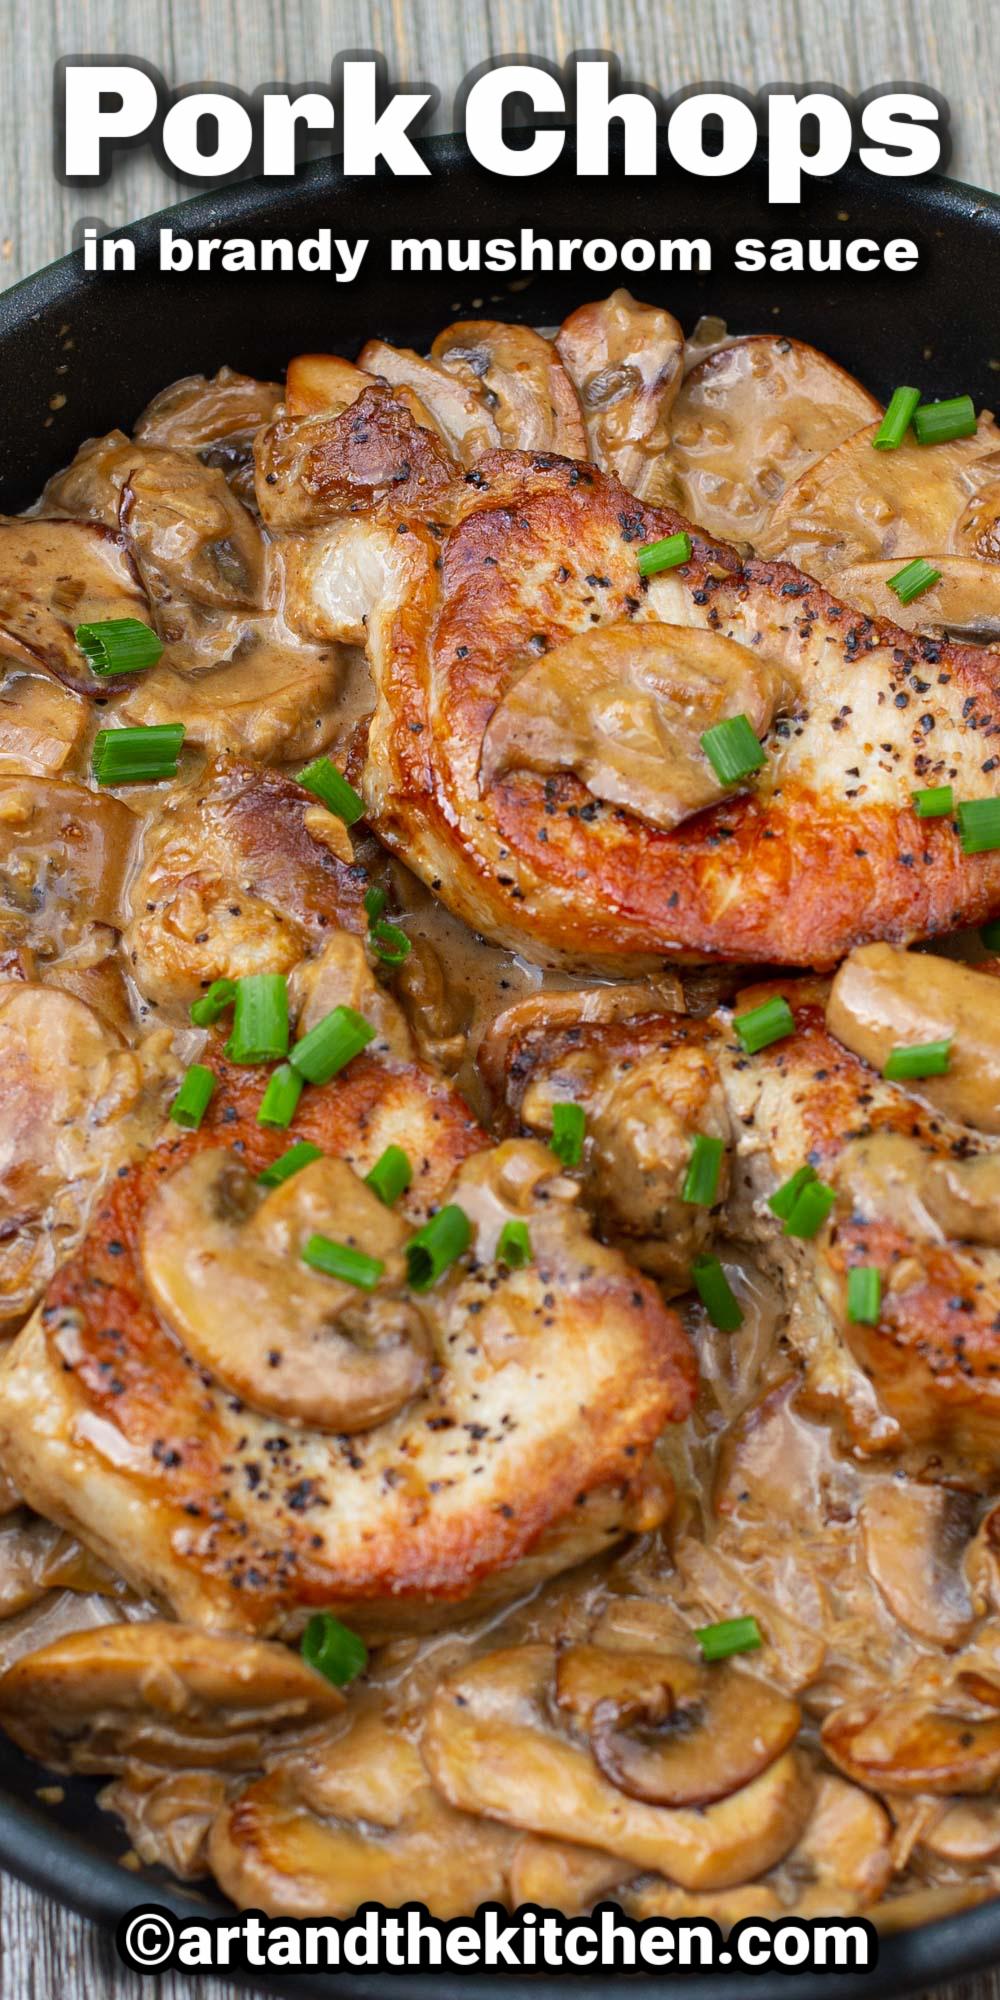 Tender, juicy Pork Chops in a Creamy Brandy Mushroom Sauce is an easy recipe that delivers gourmet flavor. A great one-pan dish. via @artandthekitch